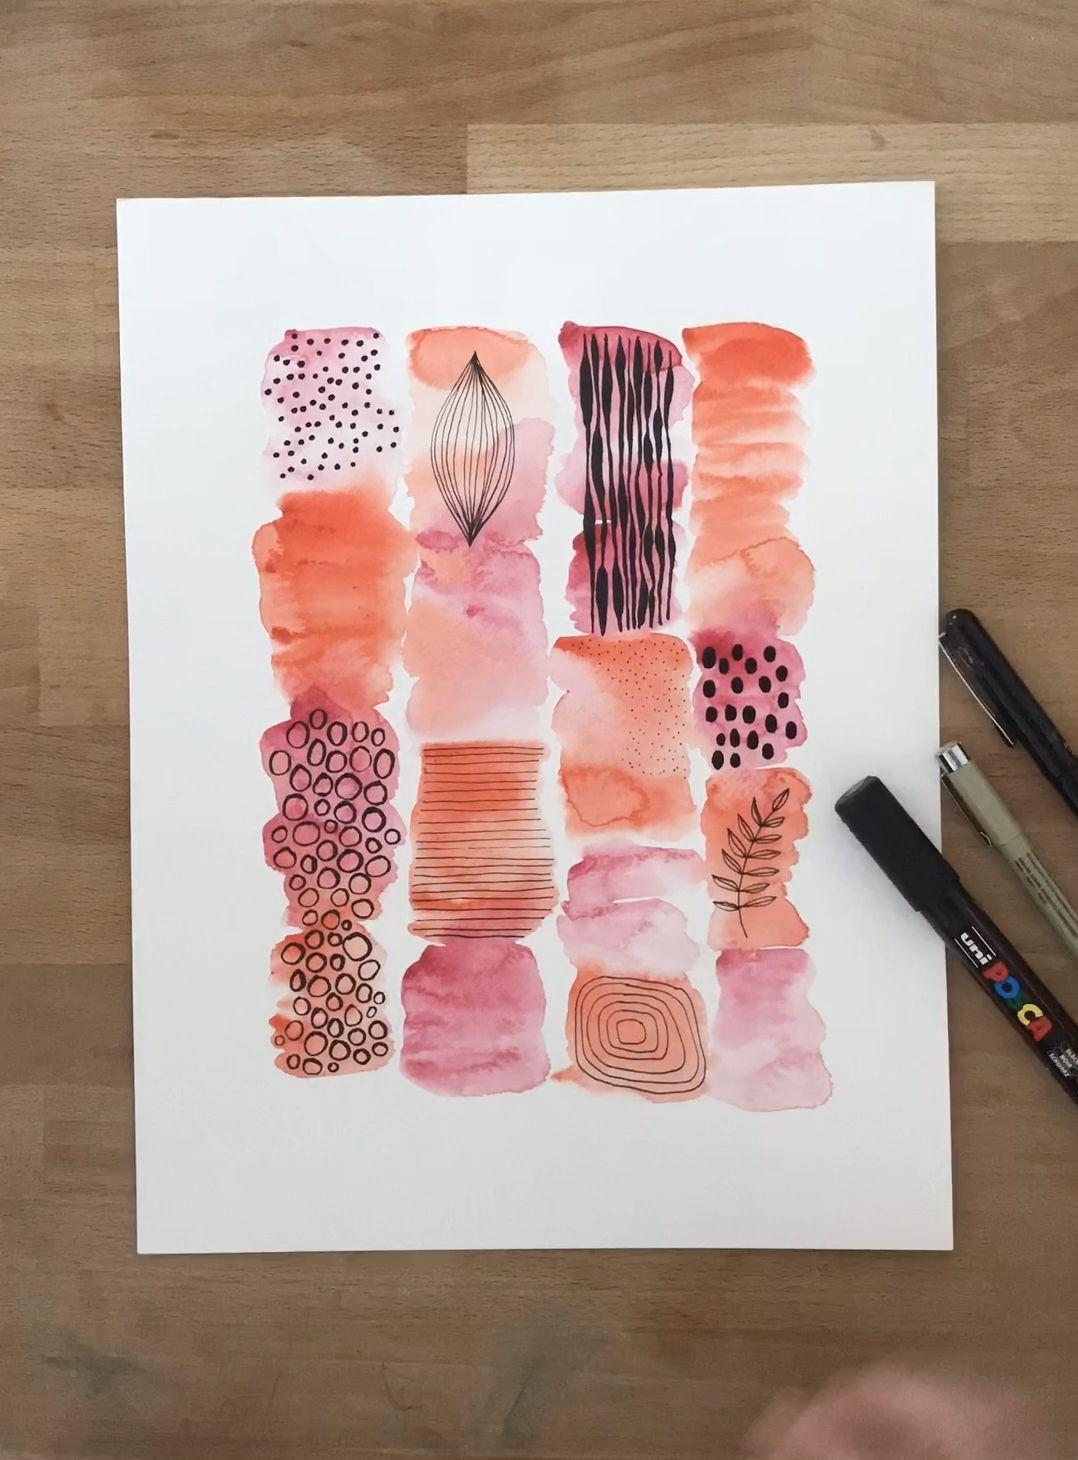 Watercolor tutorial blending colors and mark making part 2